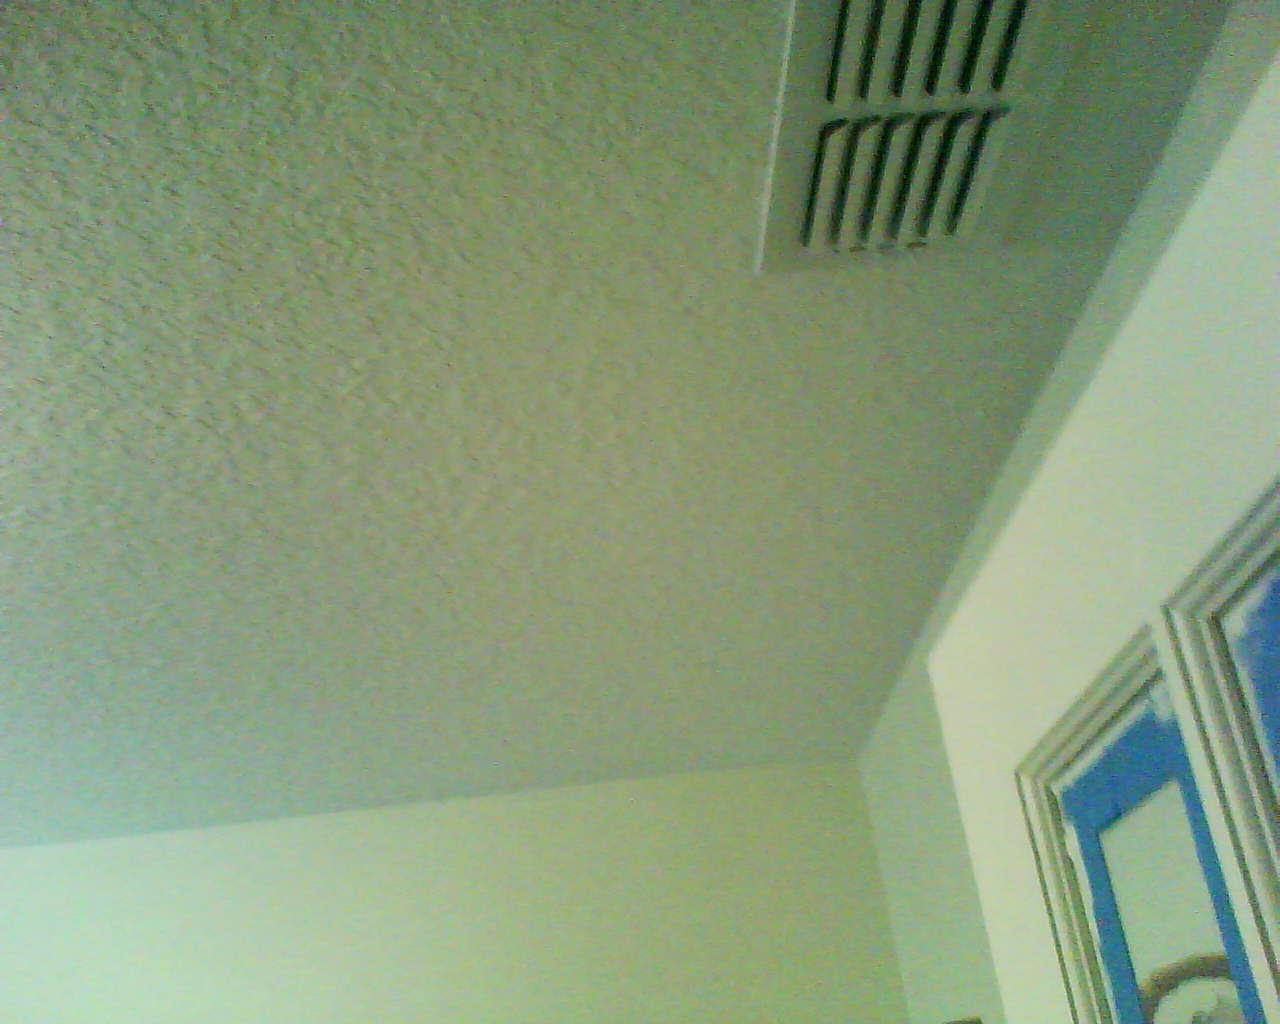 Small Square Room Acoustics